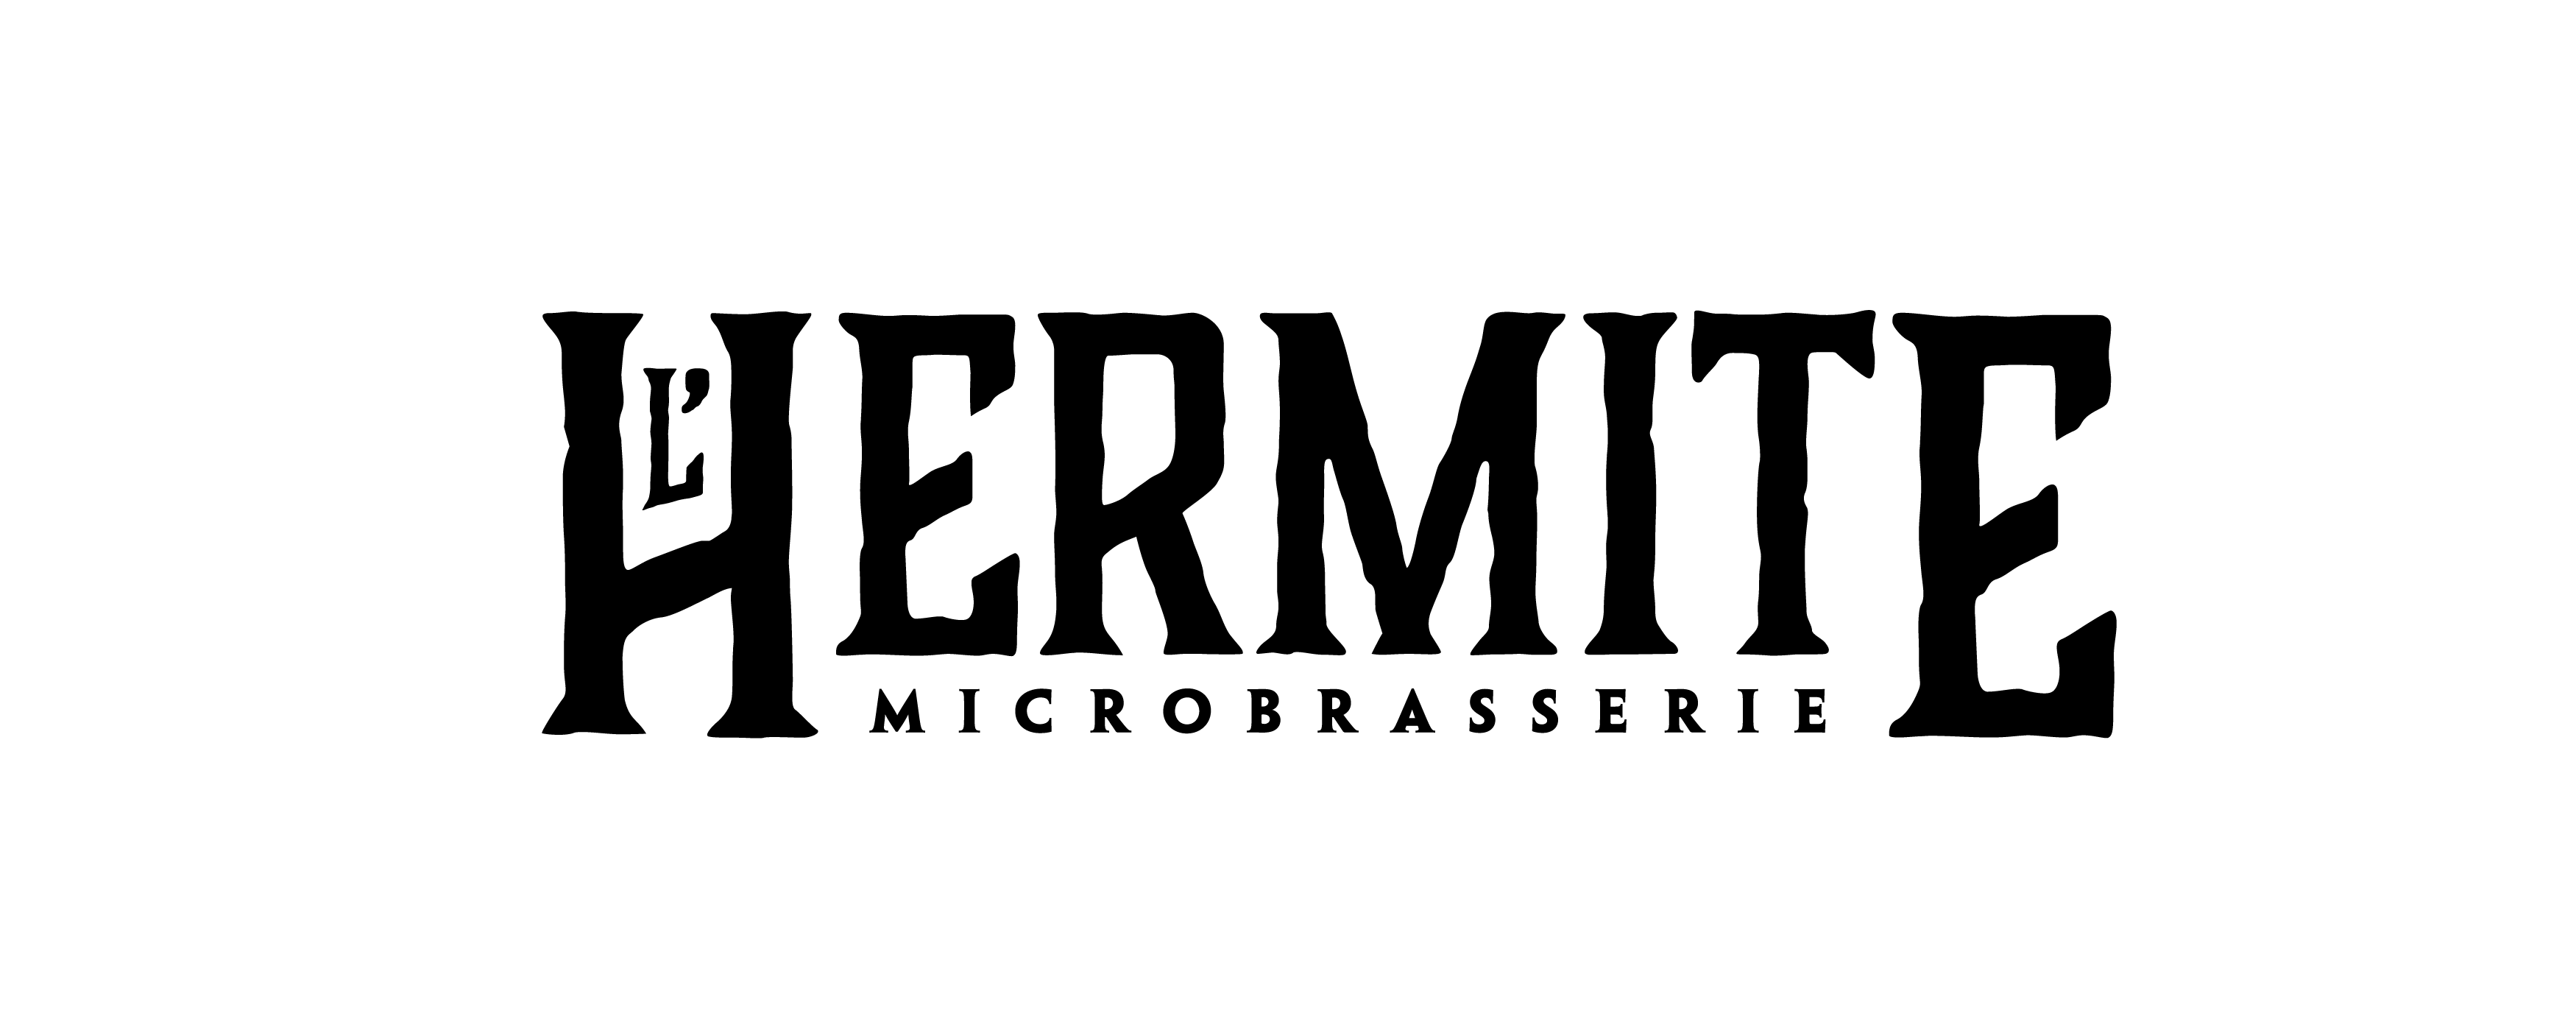 Microbrasserie L'Hermite